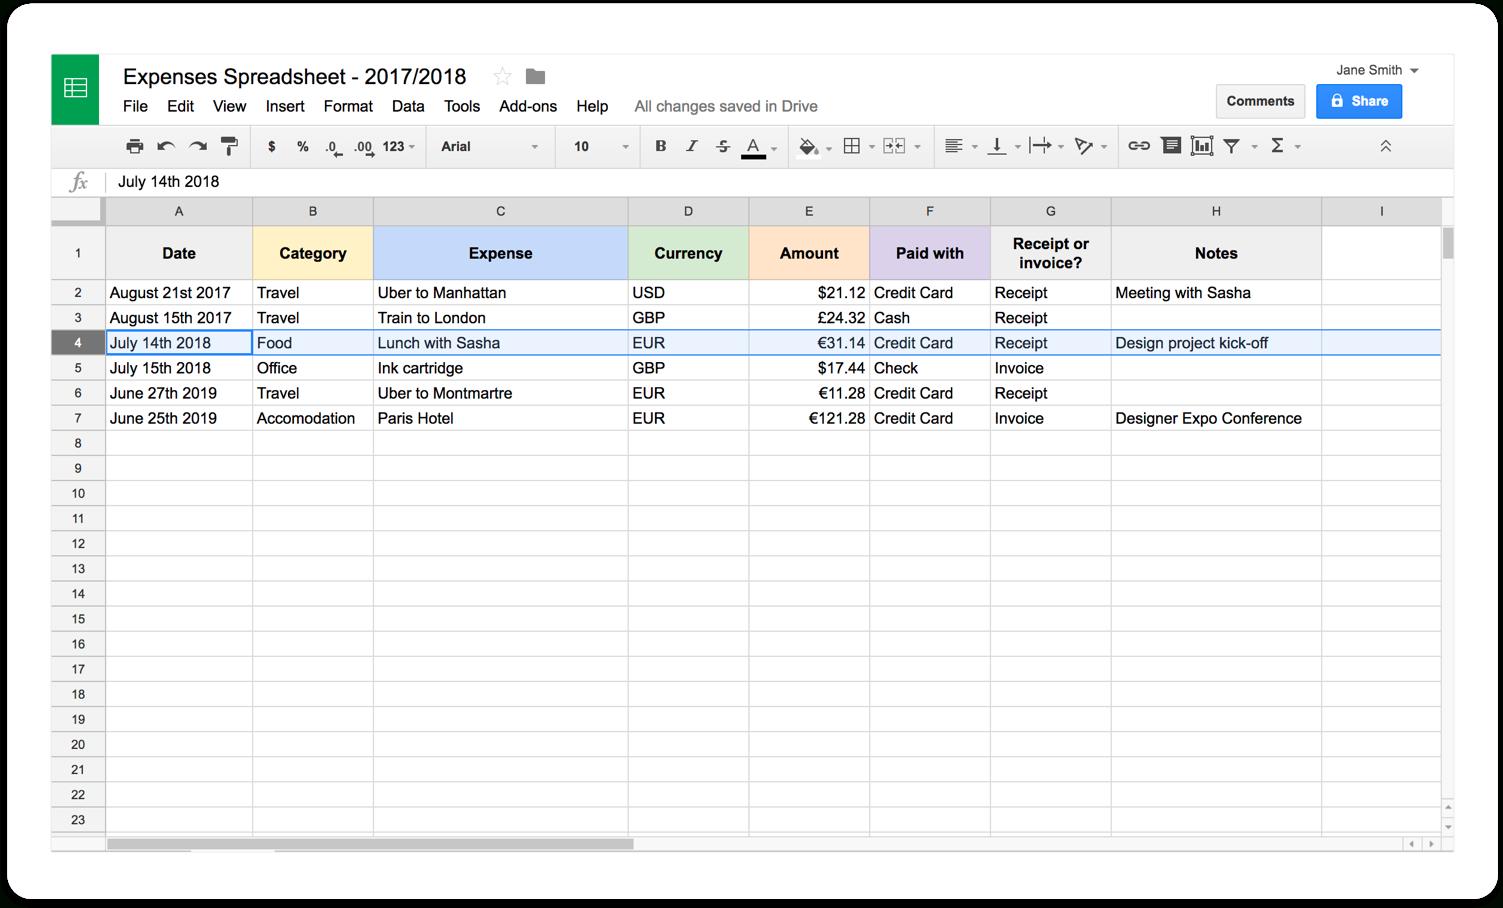 Freelance Spreadsheet Work Regarding Selfemployed Expenses Spreadsheet